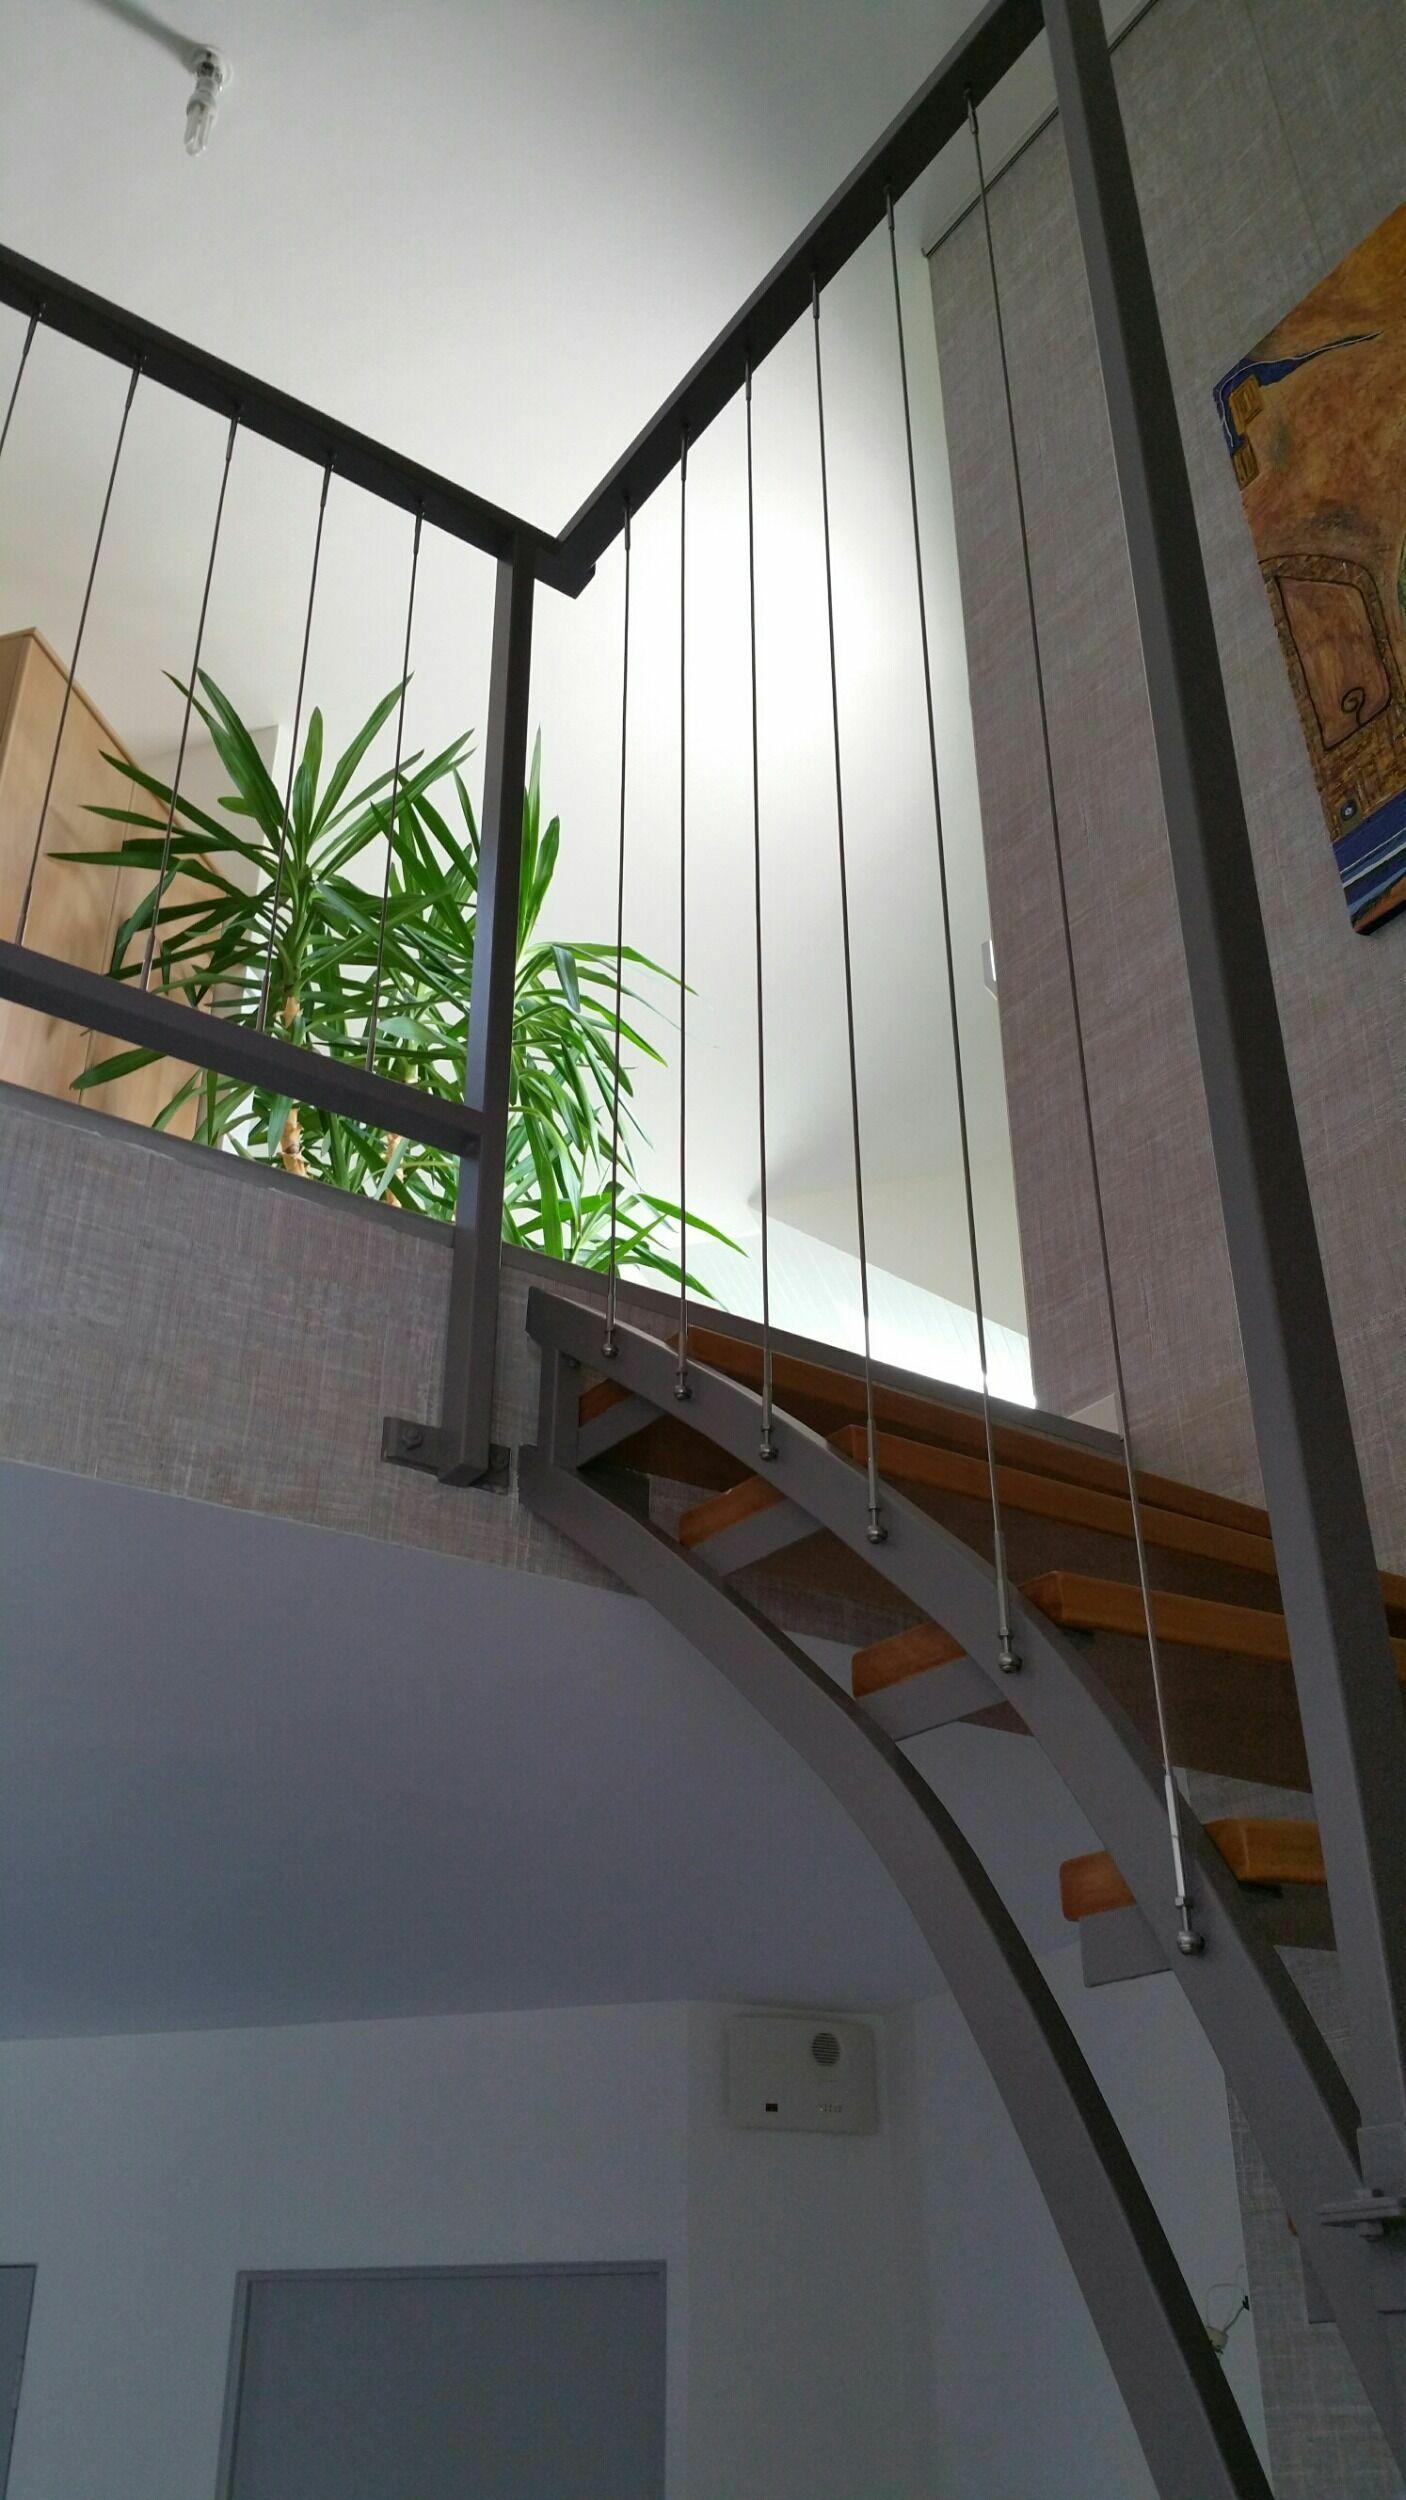 rampe escalier en c ble inox tid inox. Black Bedroom Furniture Sets. Home Design Ideas